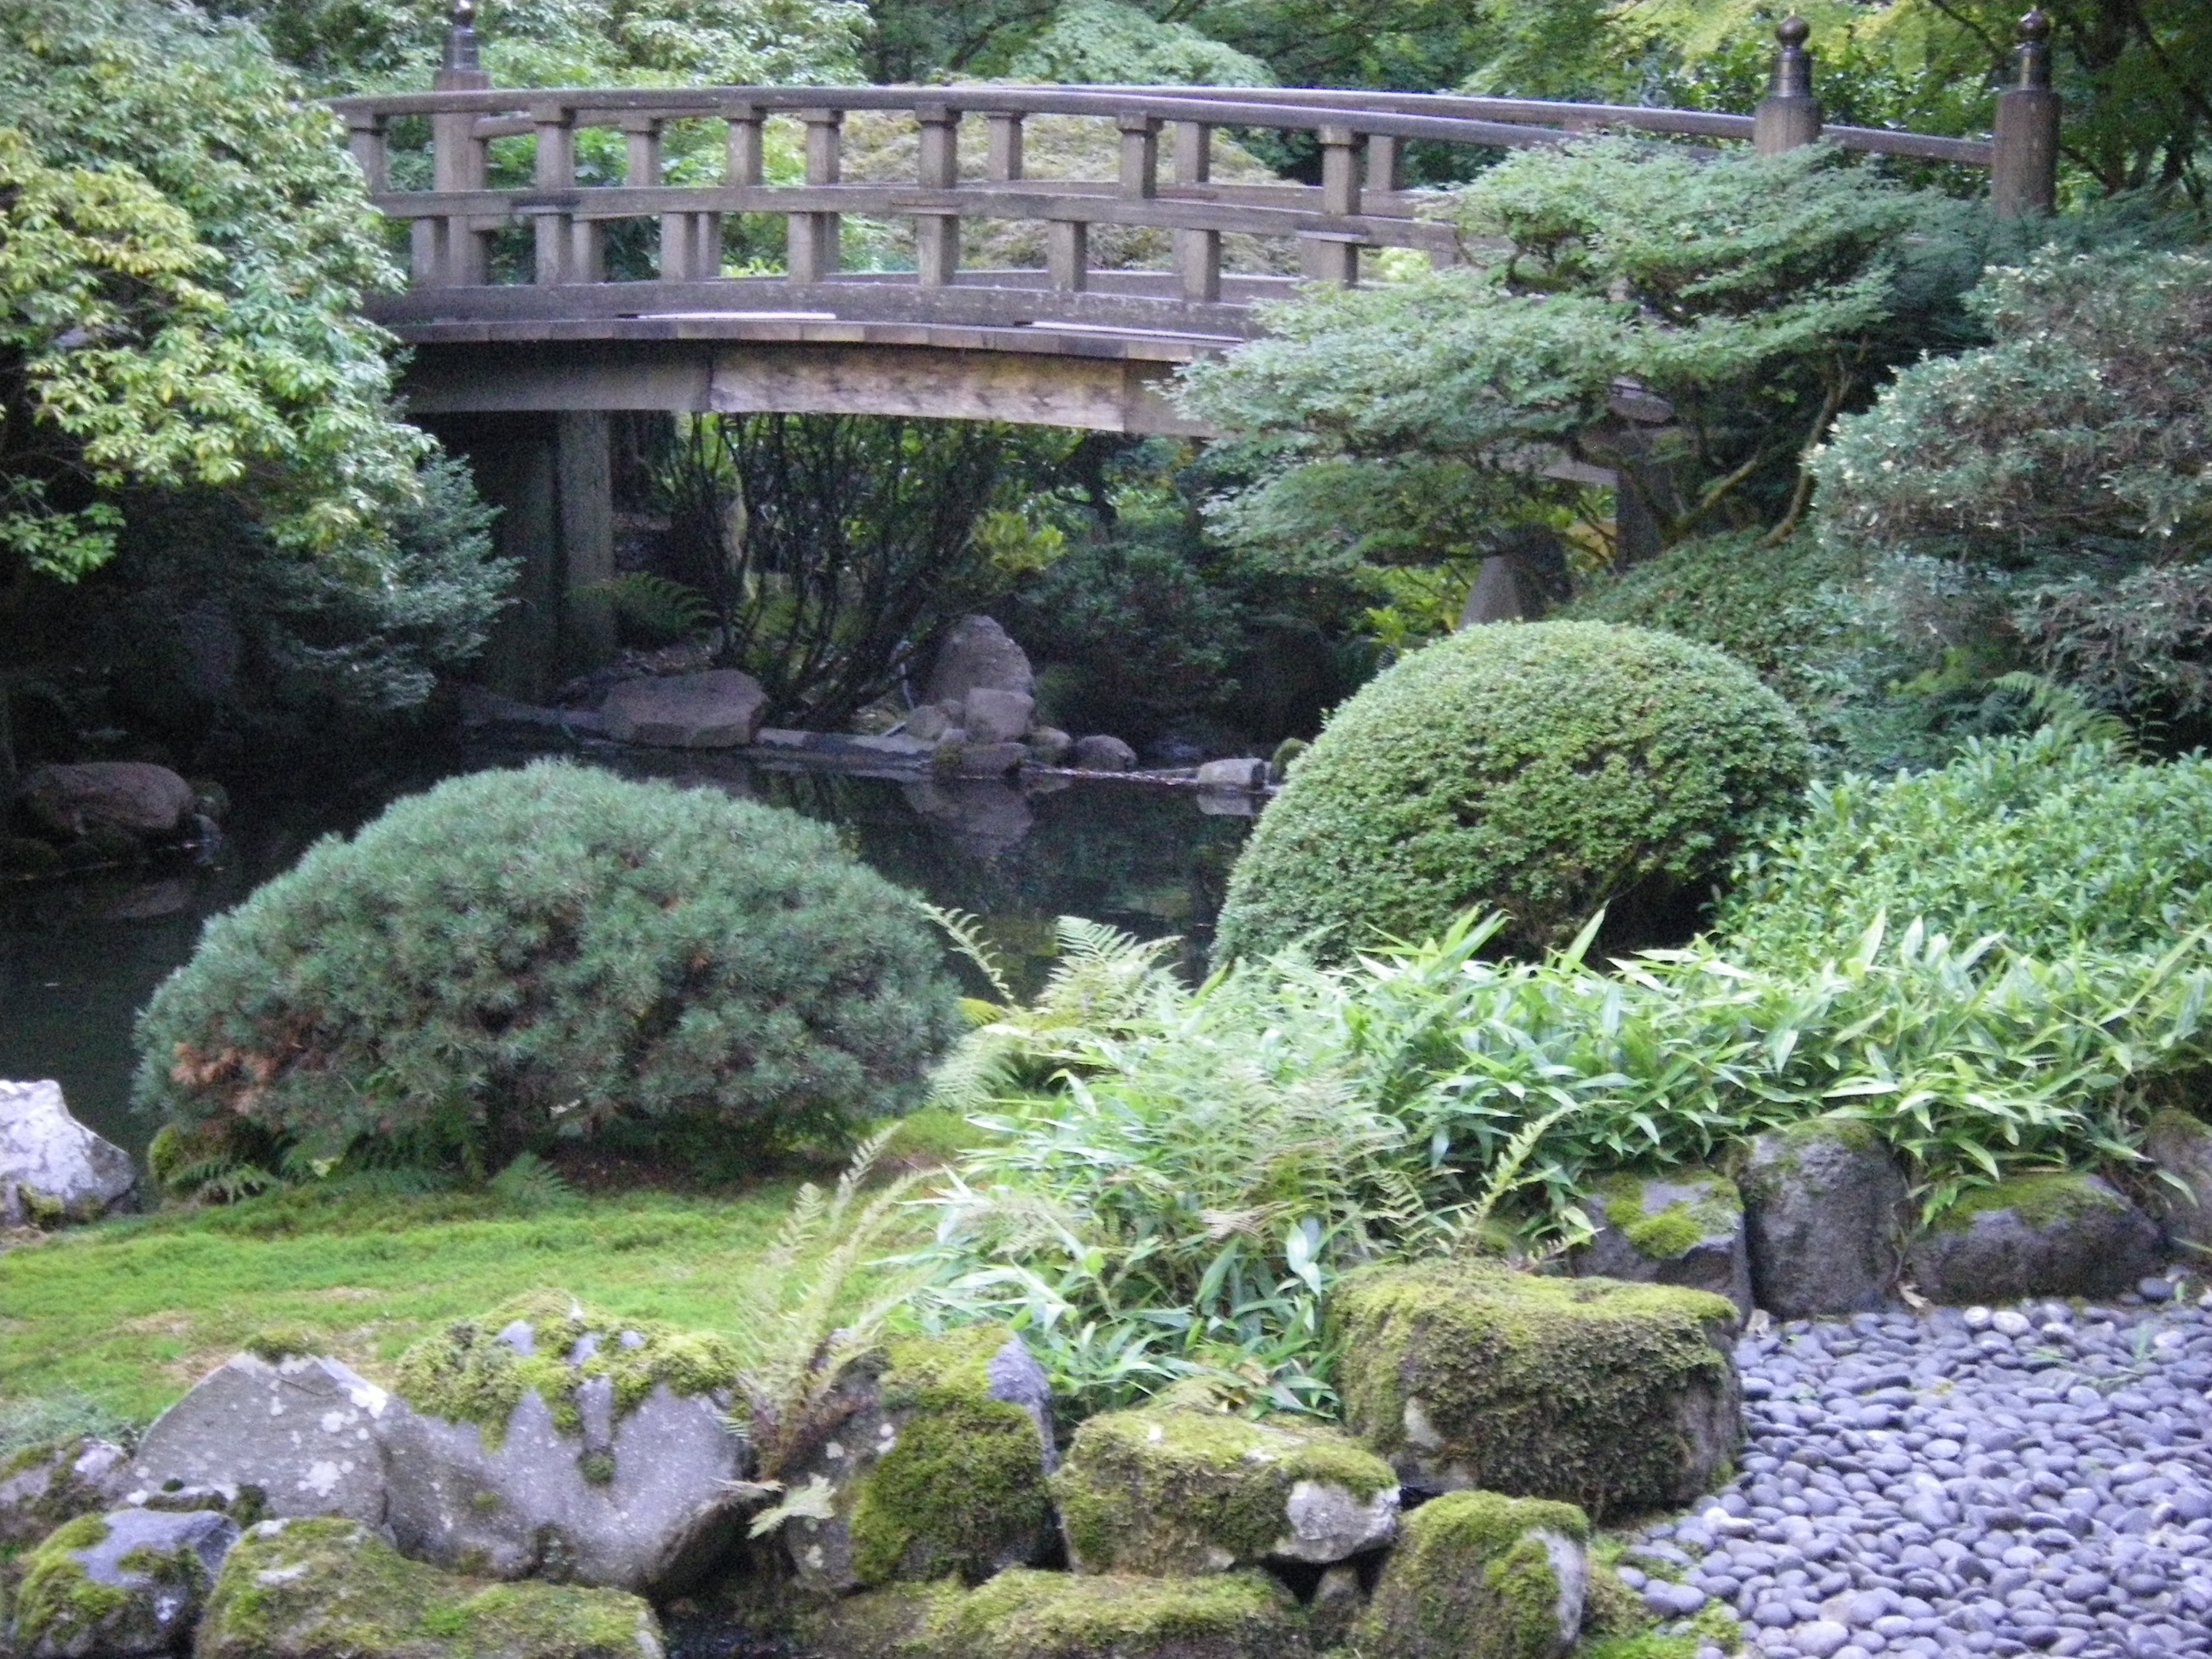 A slice of heaven japanese garden portland oregon mccool travel for Japanese garden portland oregon